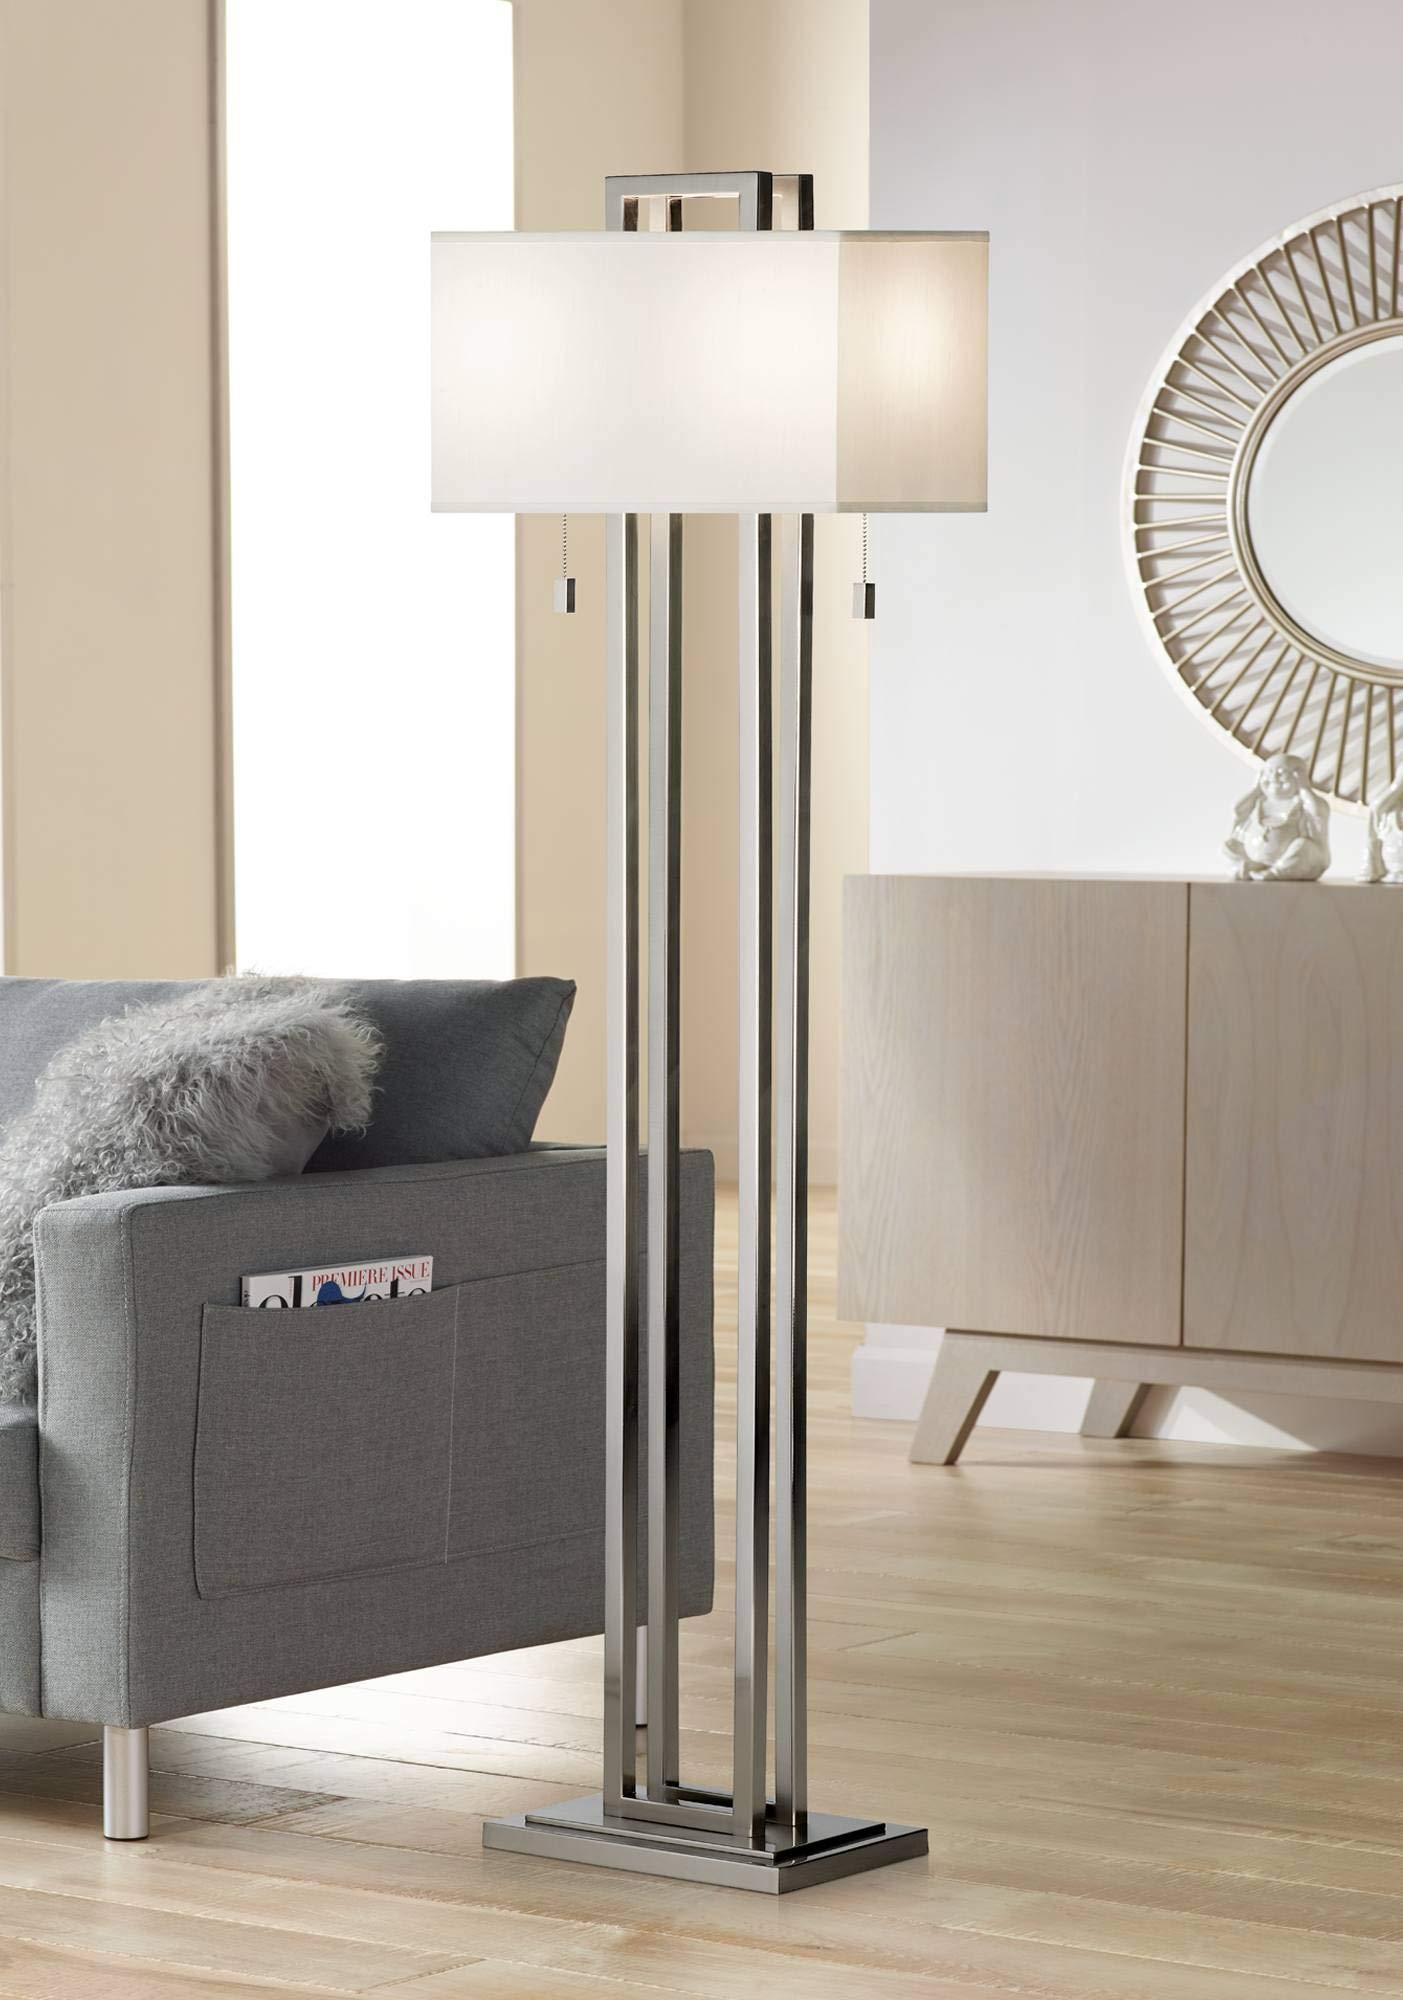 Modern Floor Lamp Brushed Nickel Openwork Rectangular Profile Off White Fabric Shade for Living Room Reading - Possini Euro Design